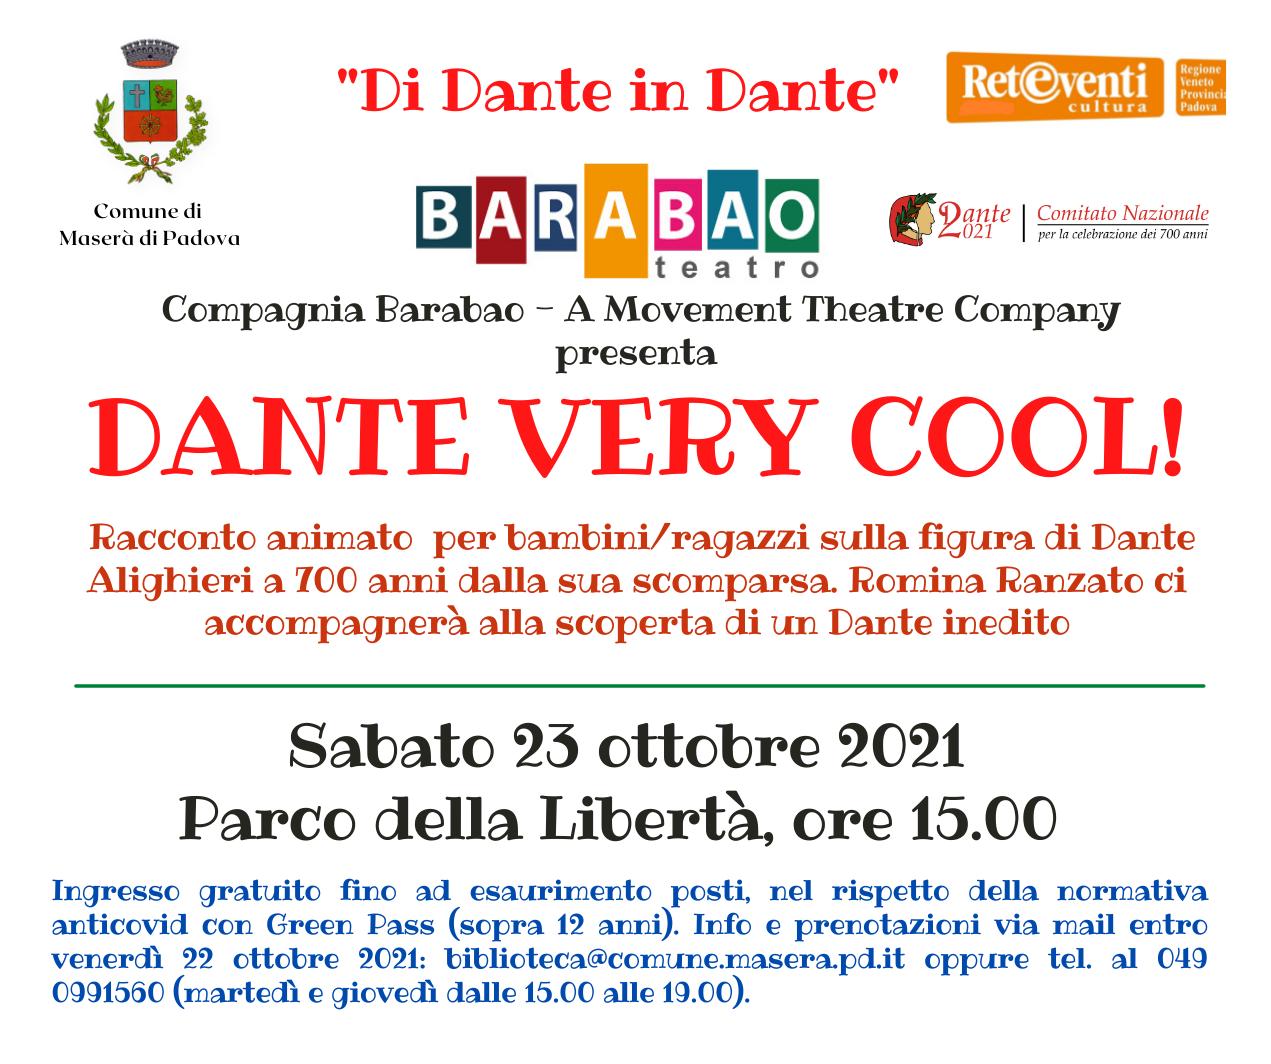 Dante very cool